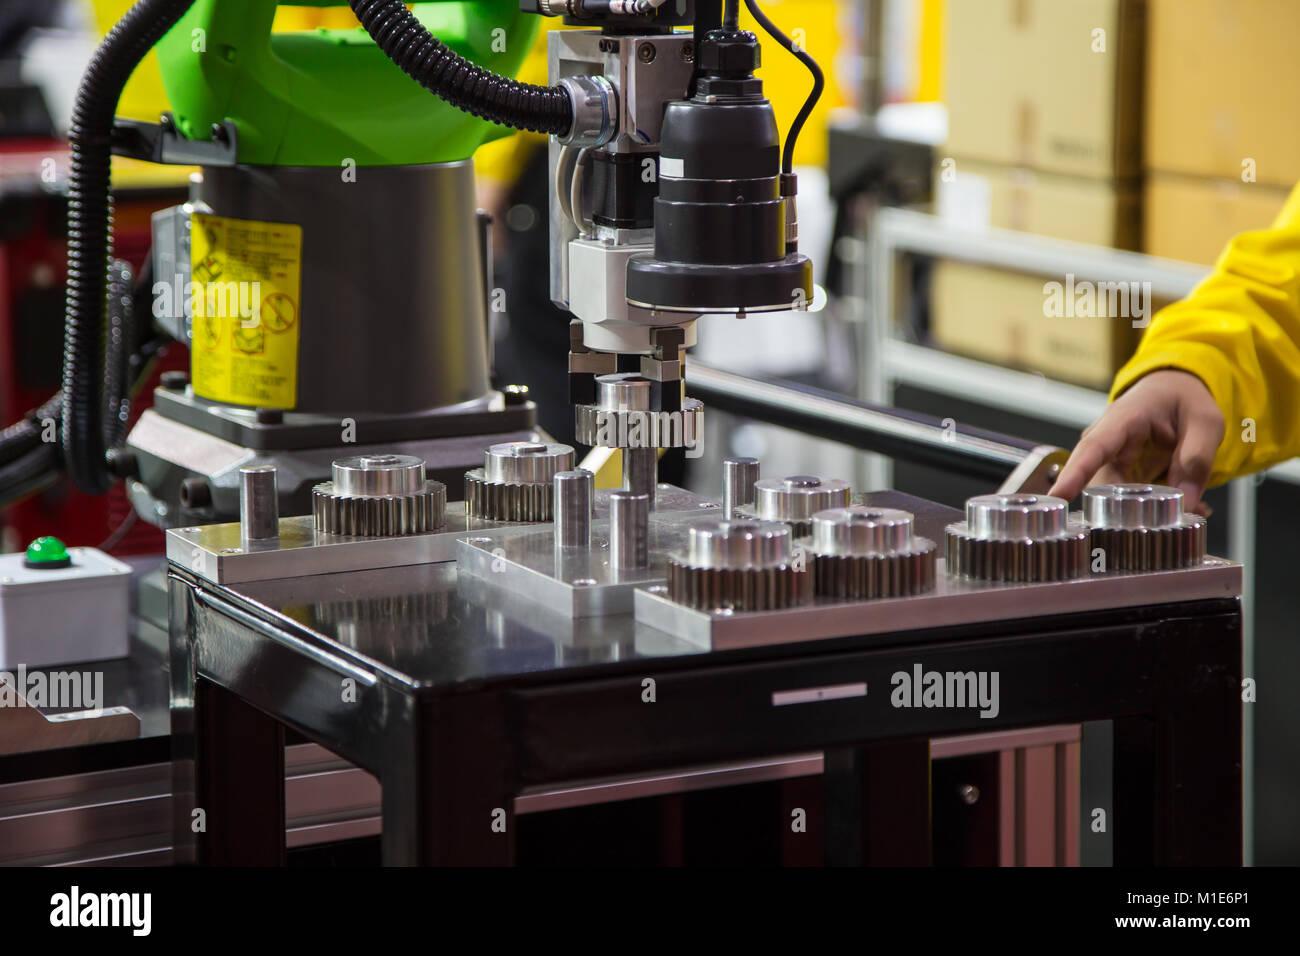 Worker operating 2D sensor robotic assembly machine - Stock Image